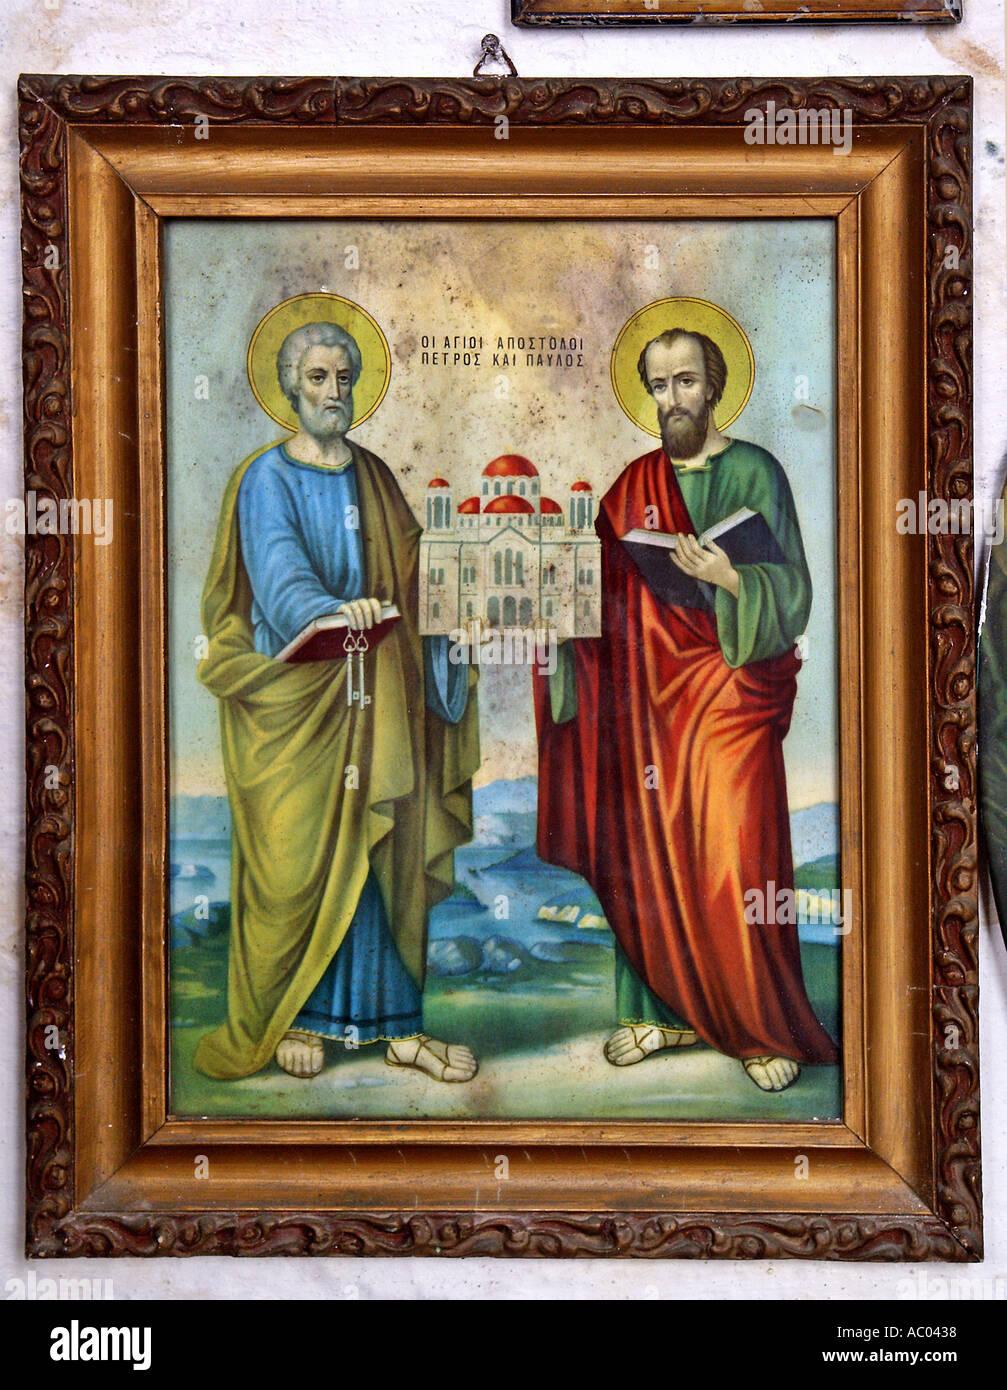 Apostles Petros Peter and Paulos Paul holding miniature church illustration old church Crete Krete island Greece - Stock Image